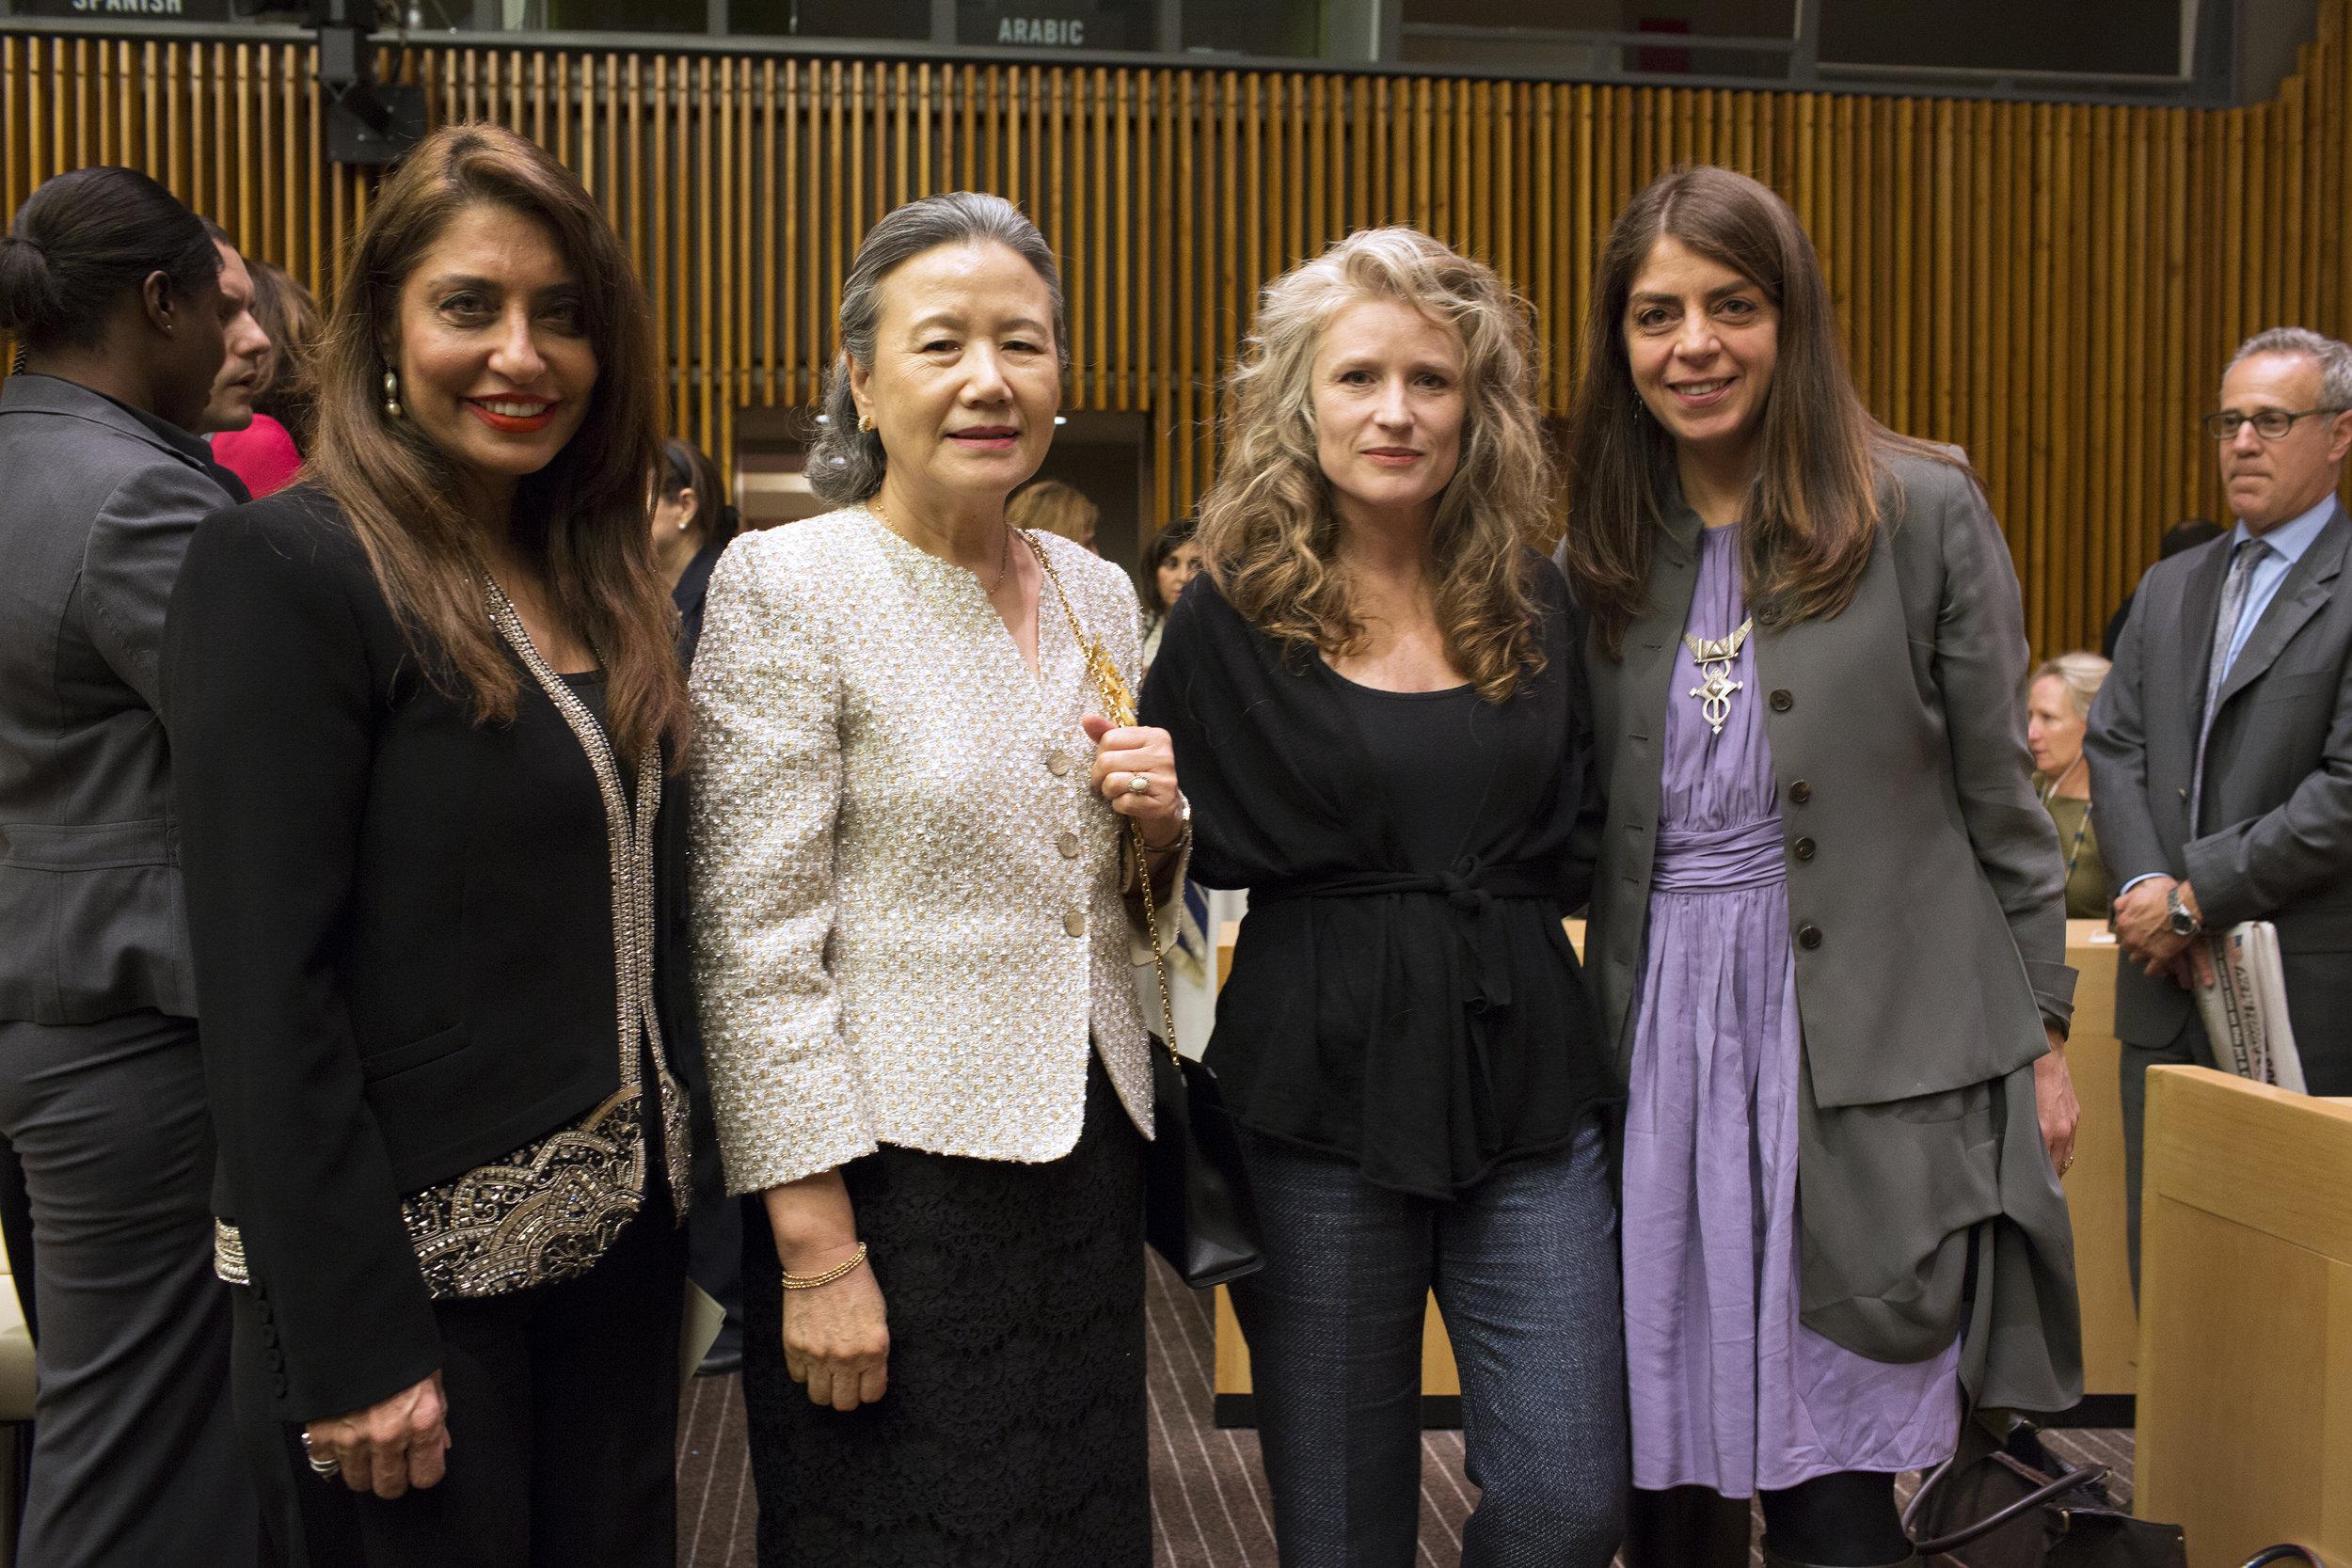 Ban Soon-taek_UNWFP Chair Muna Rihani Al-Nasser_Cynthia Hill_Nancy Abraham .JPG